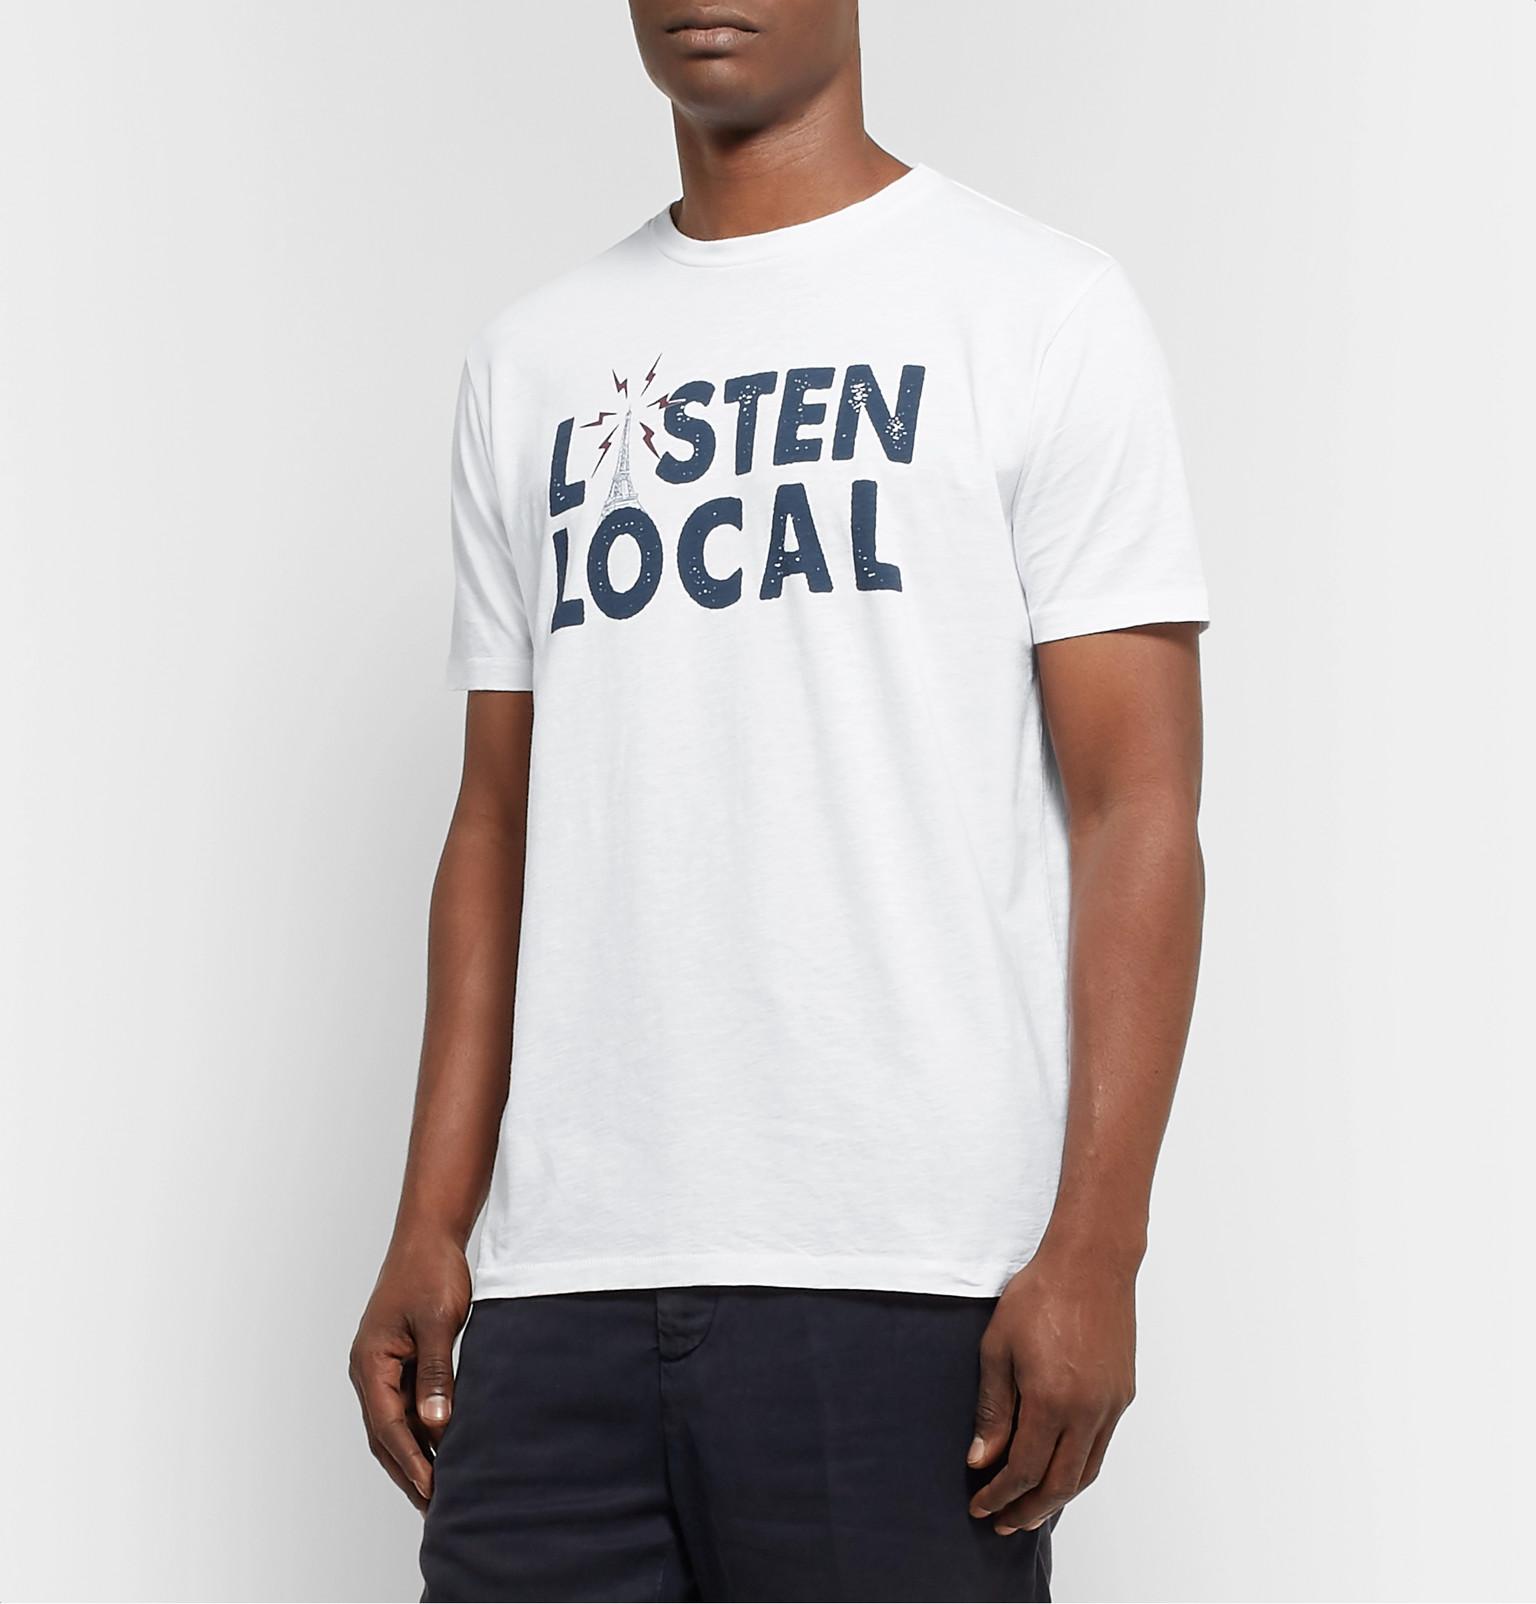 premium selection 581b8 e1f28 Hartford - Listen Local Printed Cotton-Jersey T-Shirt